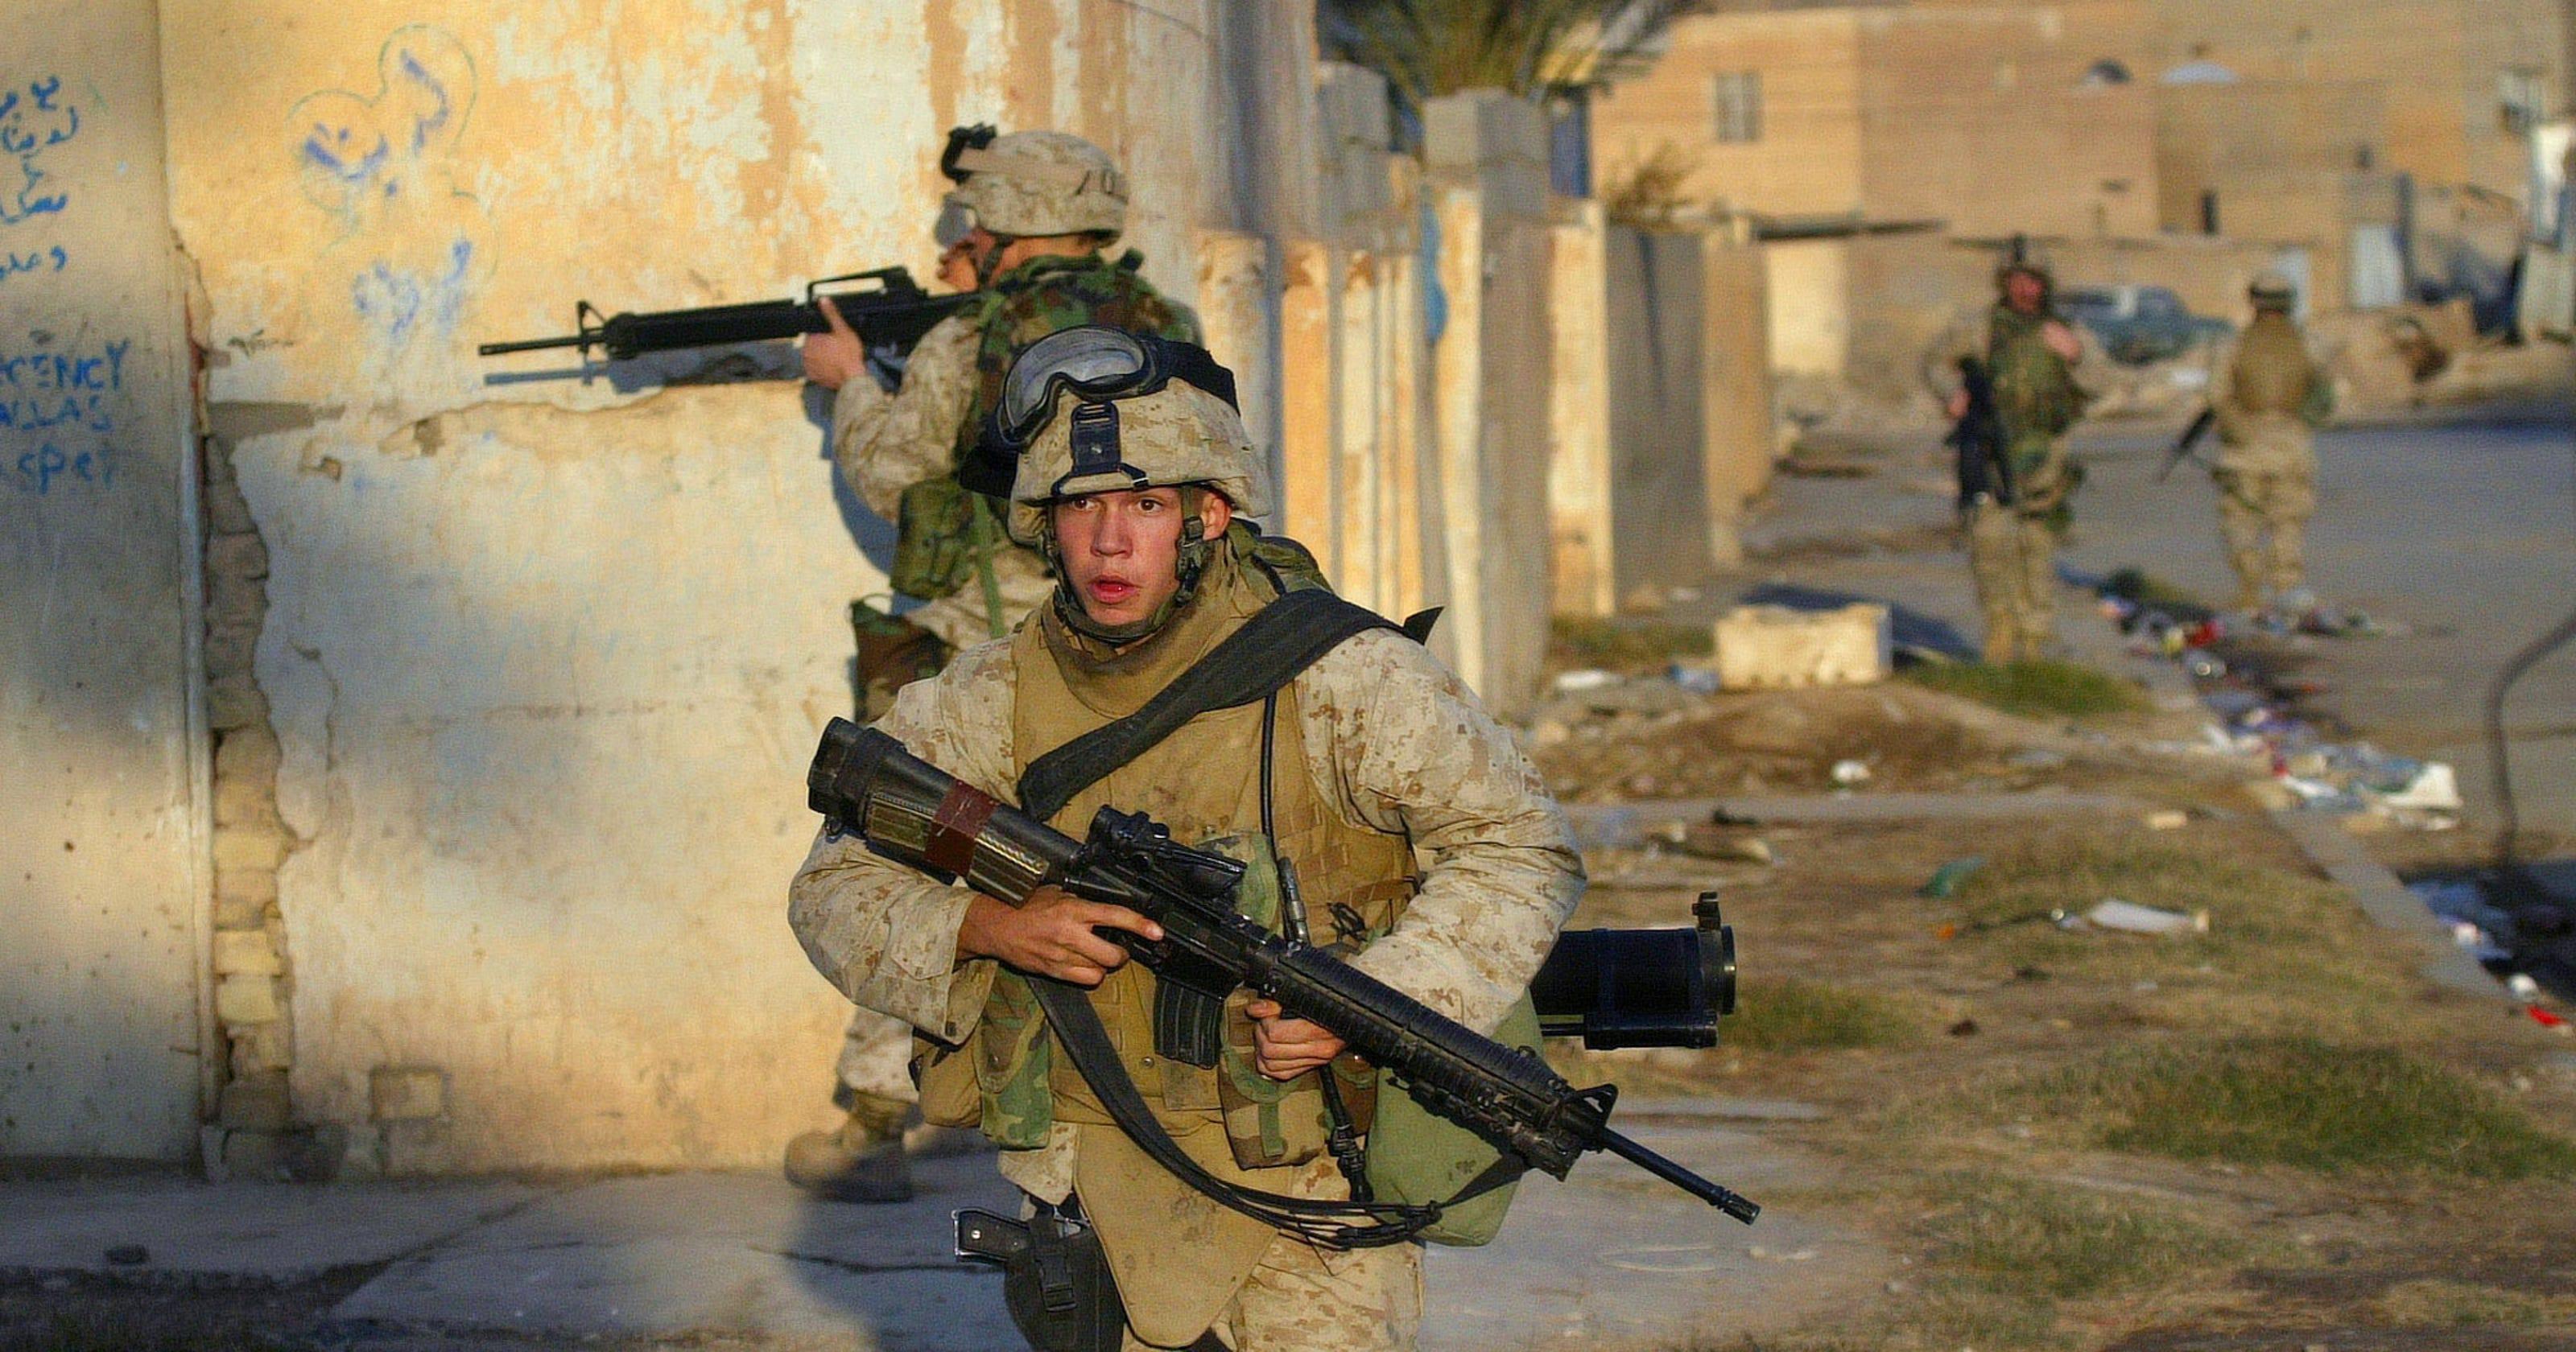 The Magnificent Bastards look back on a key Iraq battle